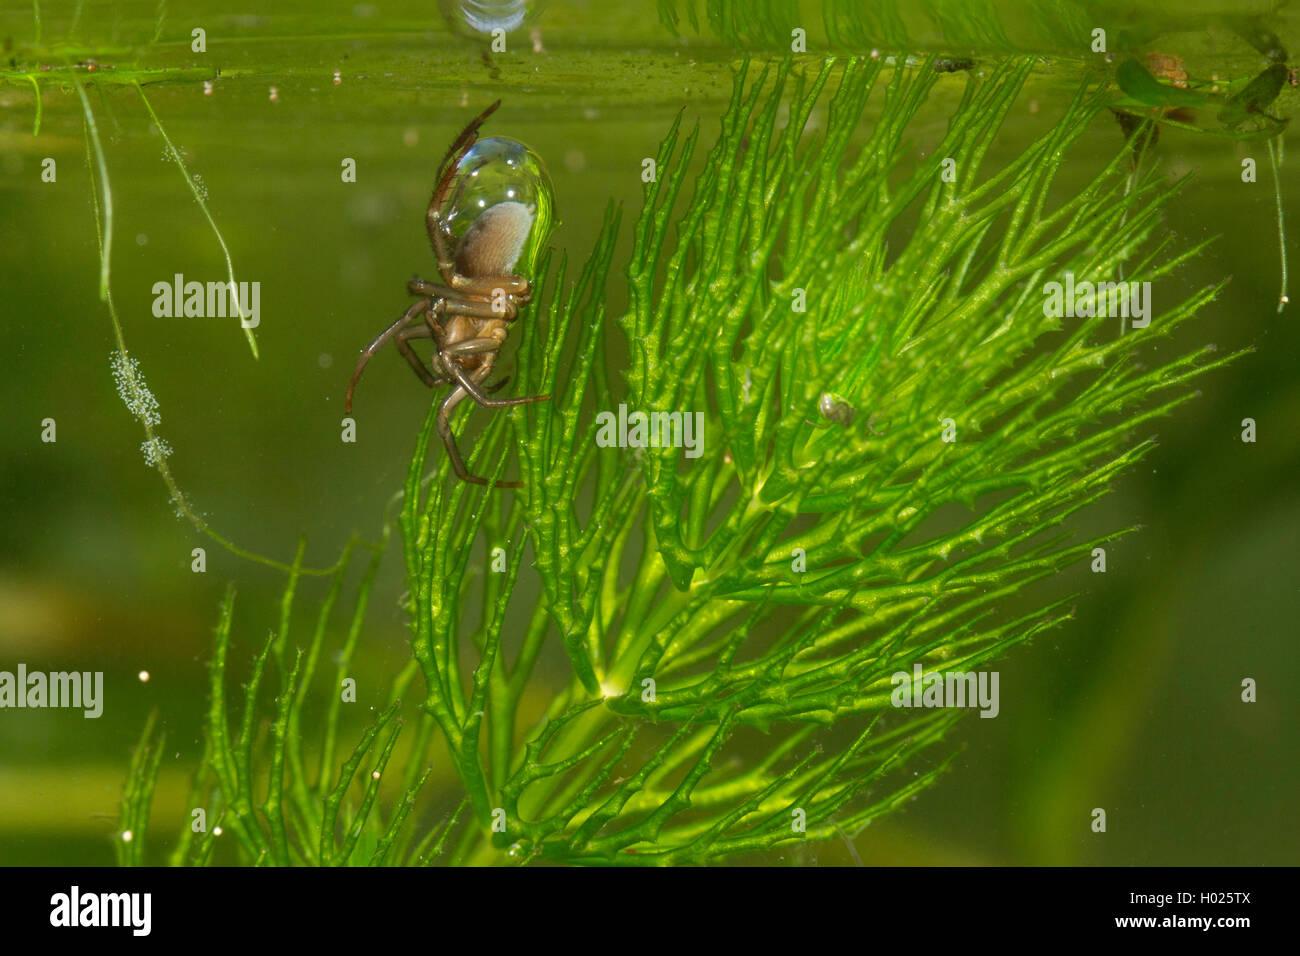 Wasserspinne, Wasser-Spinne, Silberspinne, Silber-Spinne (Argyroneta aquatica), Weibchen transportiert Luft zur Tauchglocke, De Foto de stock